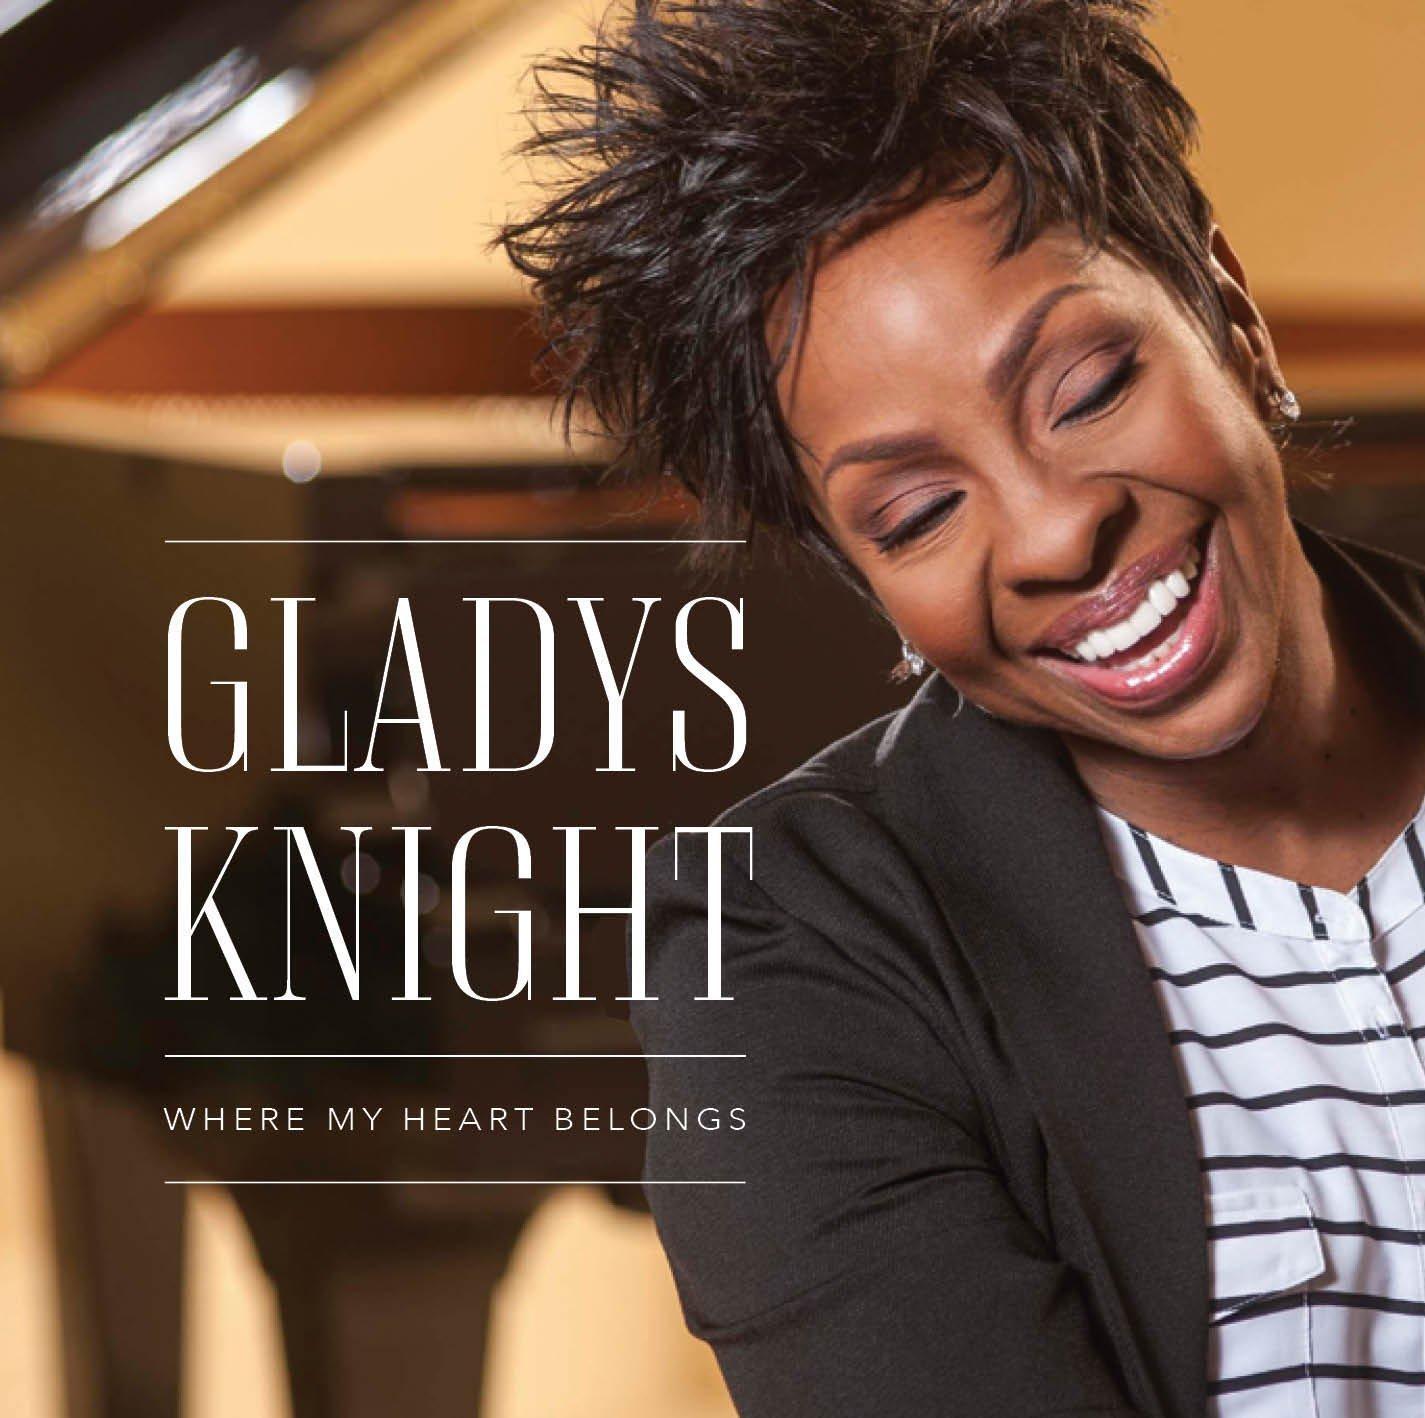 Soulsations Sunday New Gospel Album From Rb Legend Gladys Knight